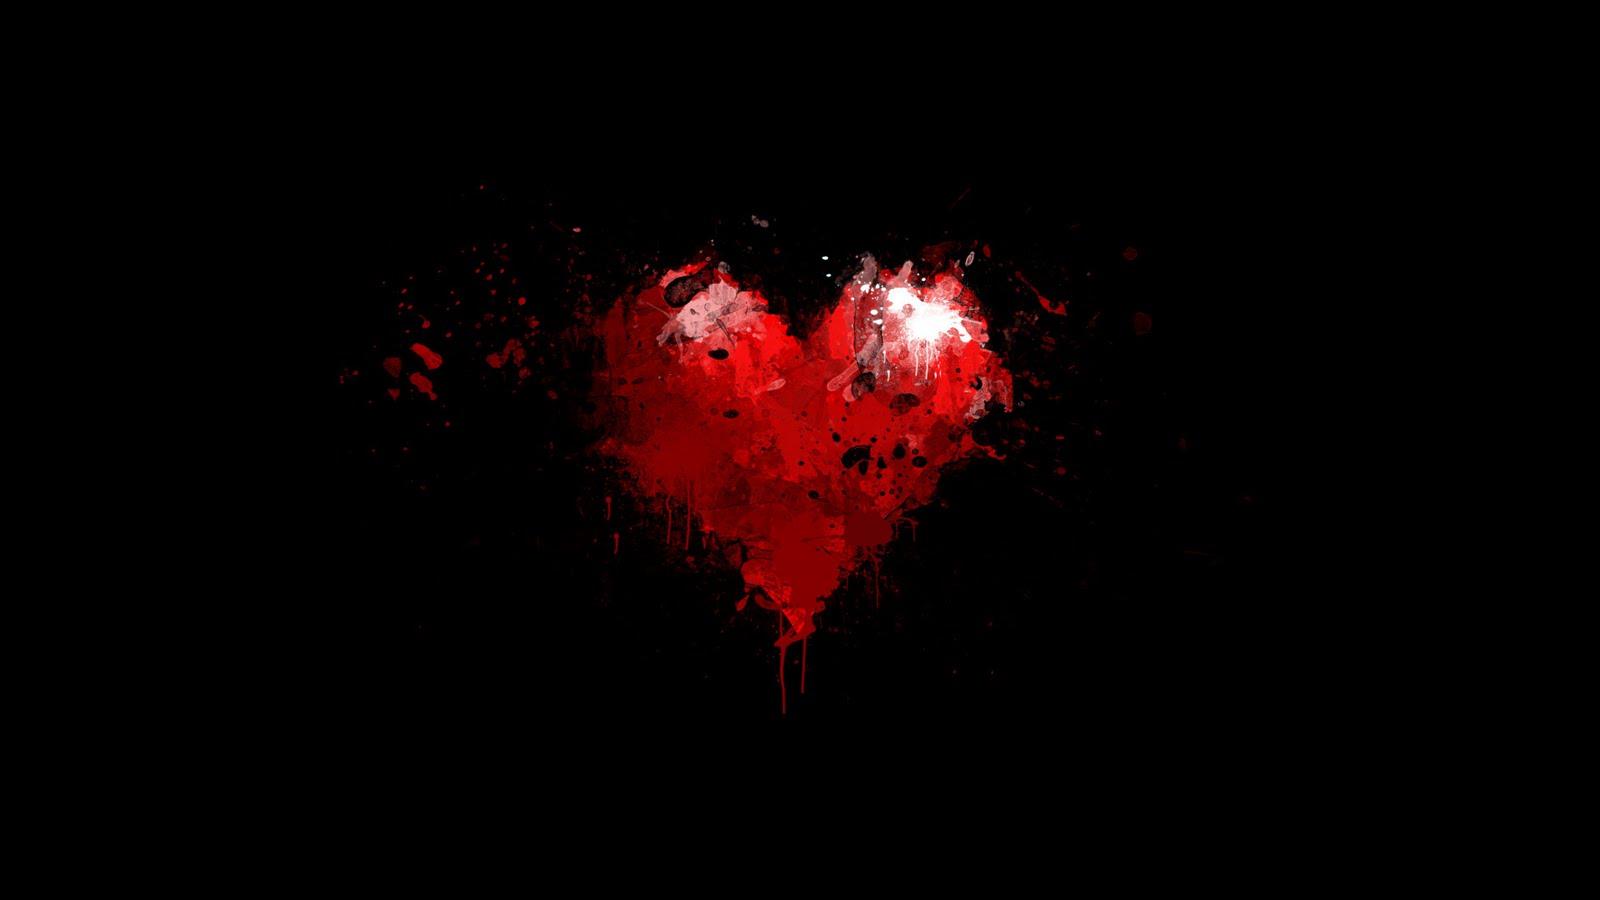 Romantic Wallpapers HD Wallpapers Heart Wallpaper Love Wallpapers 4U 1600x900